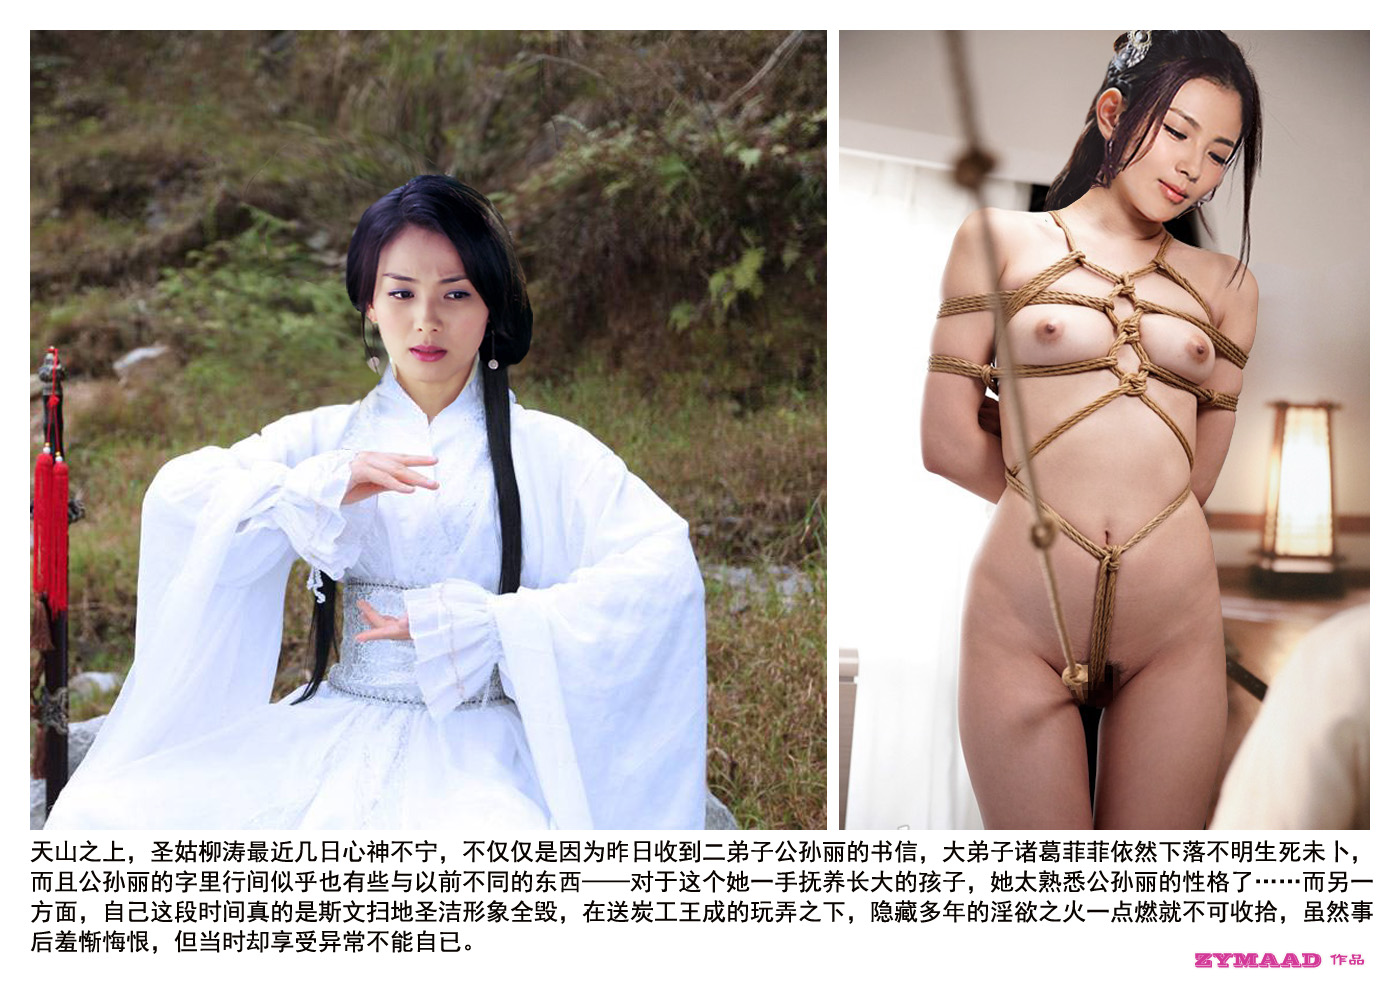 Sexinsex 极乐神教 刘亦菲 SexInSex! Board